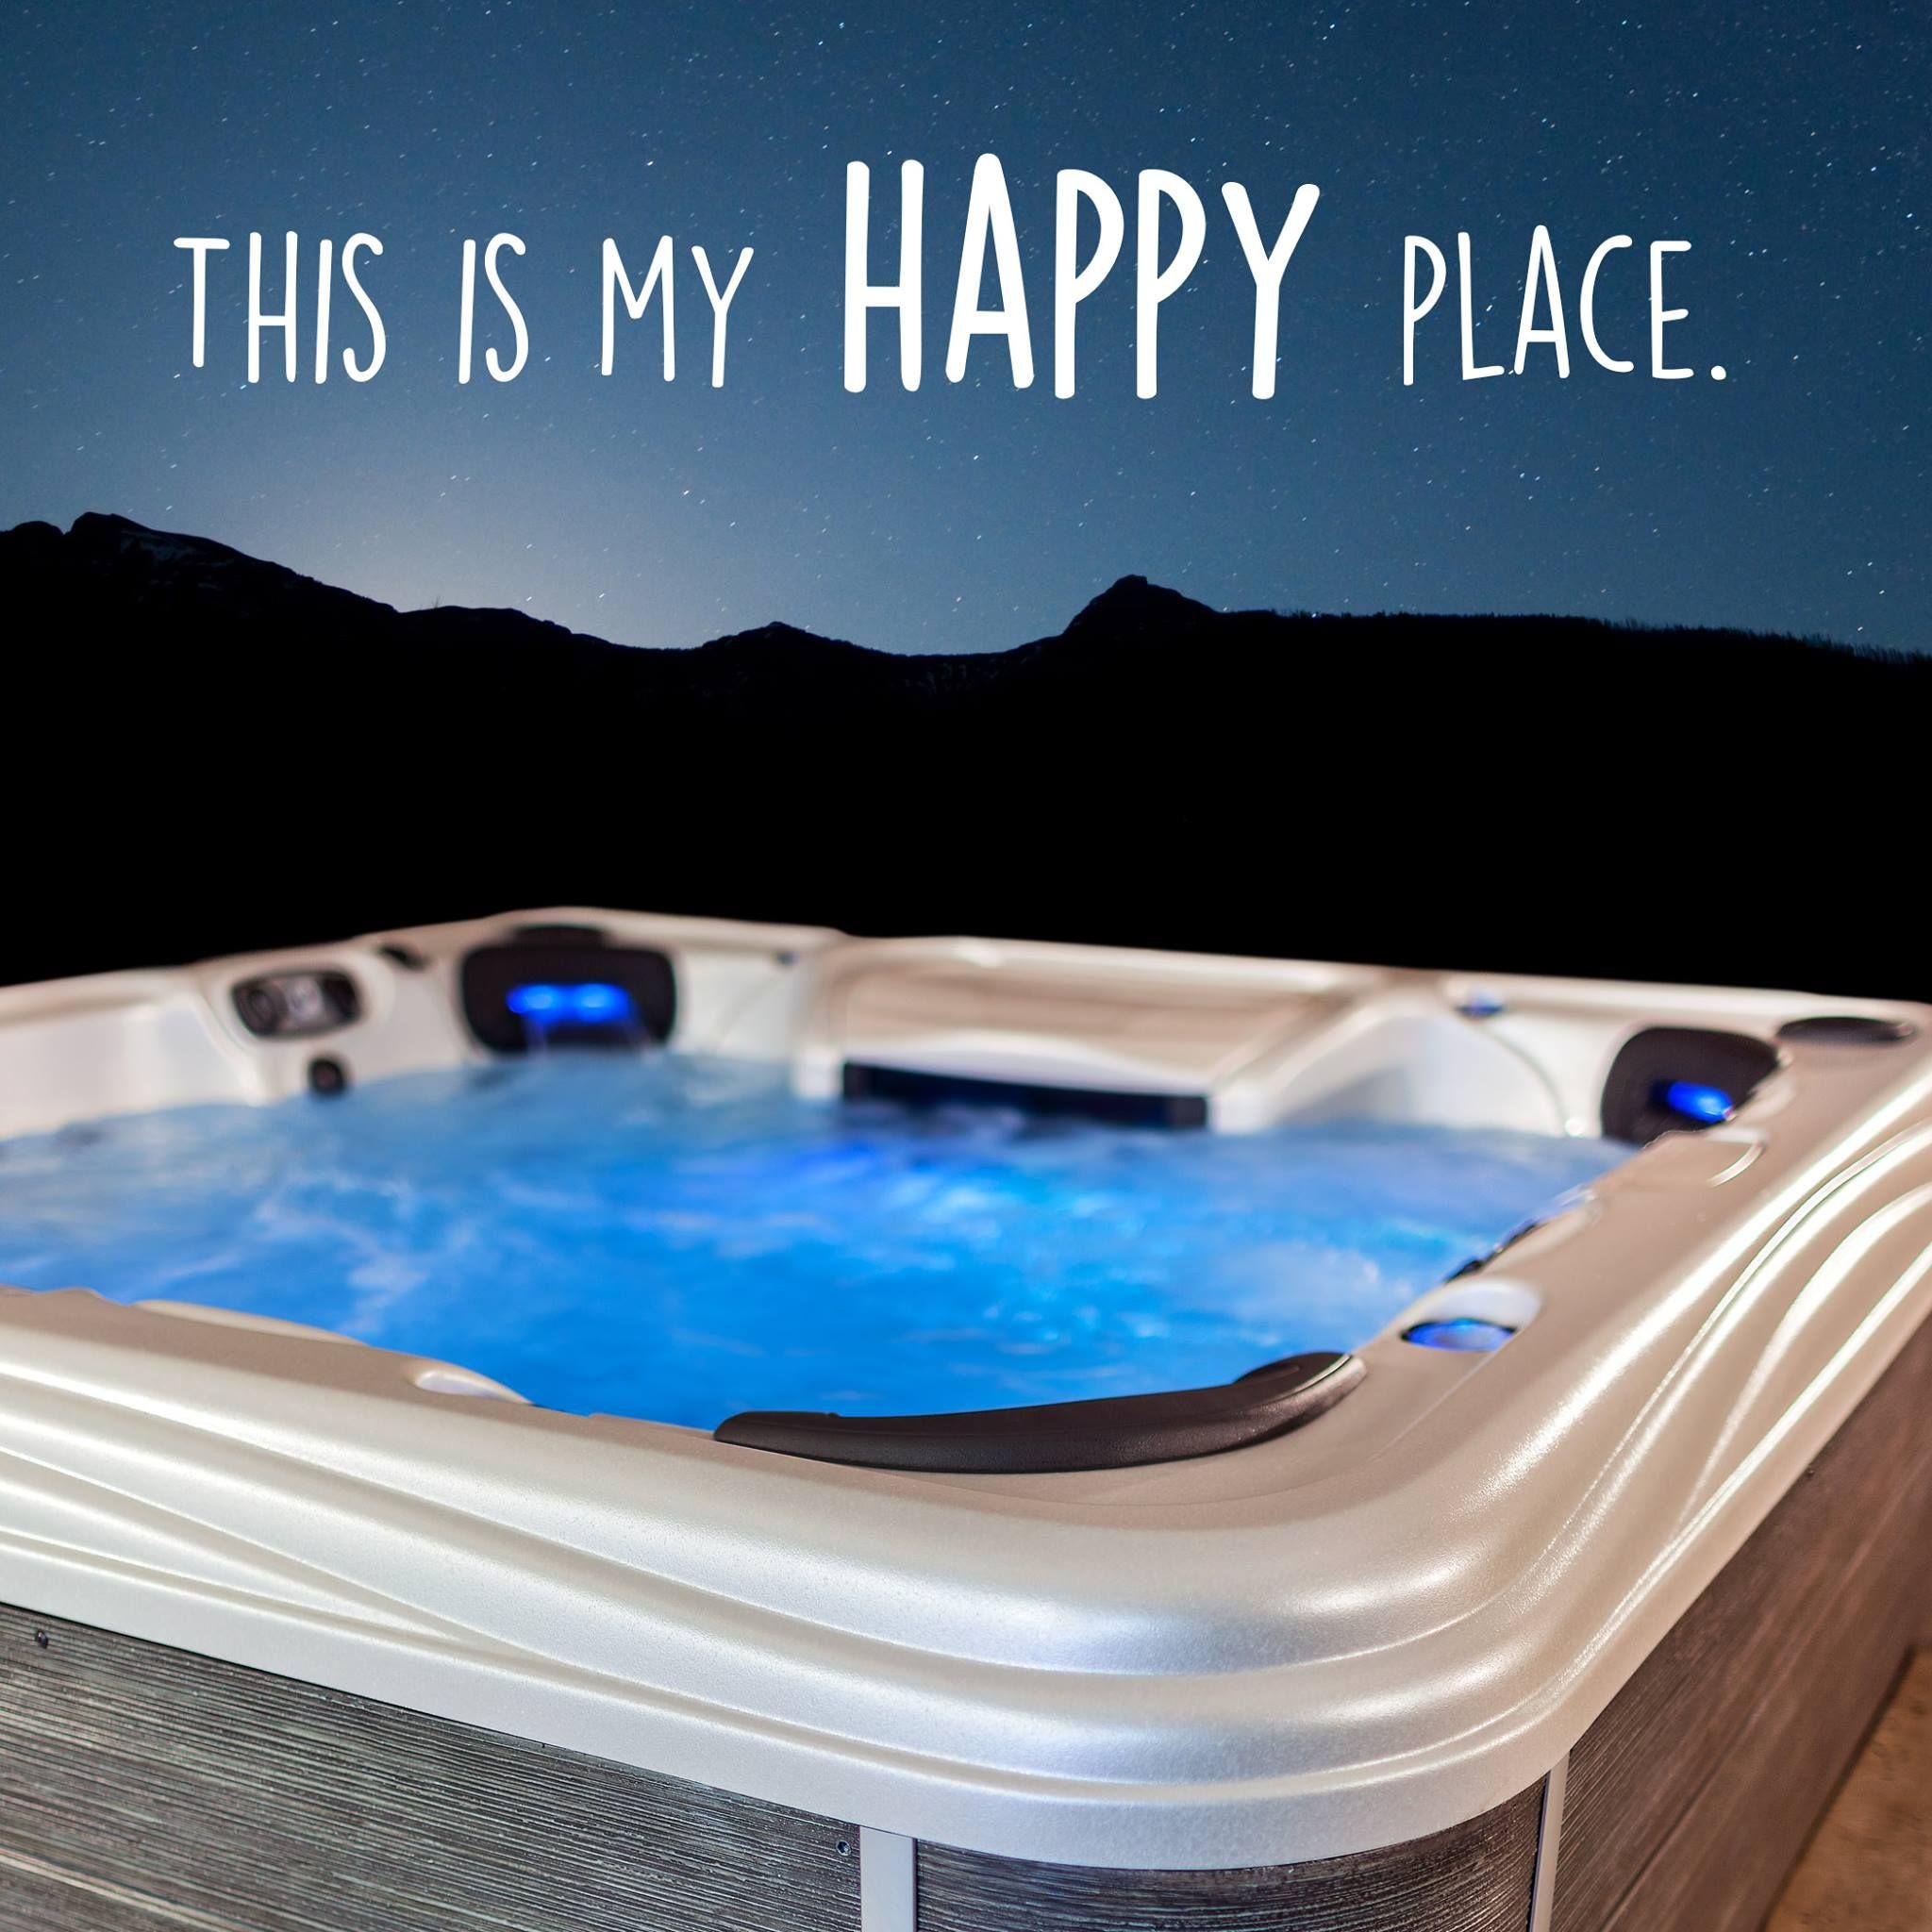 Artesian Spa Available At Creative Spa Designs 4145 South Grand